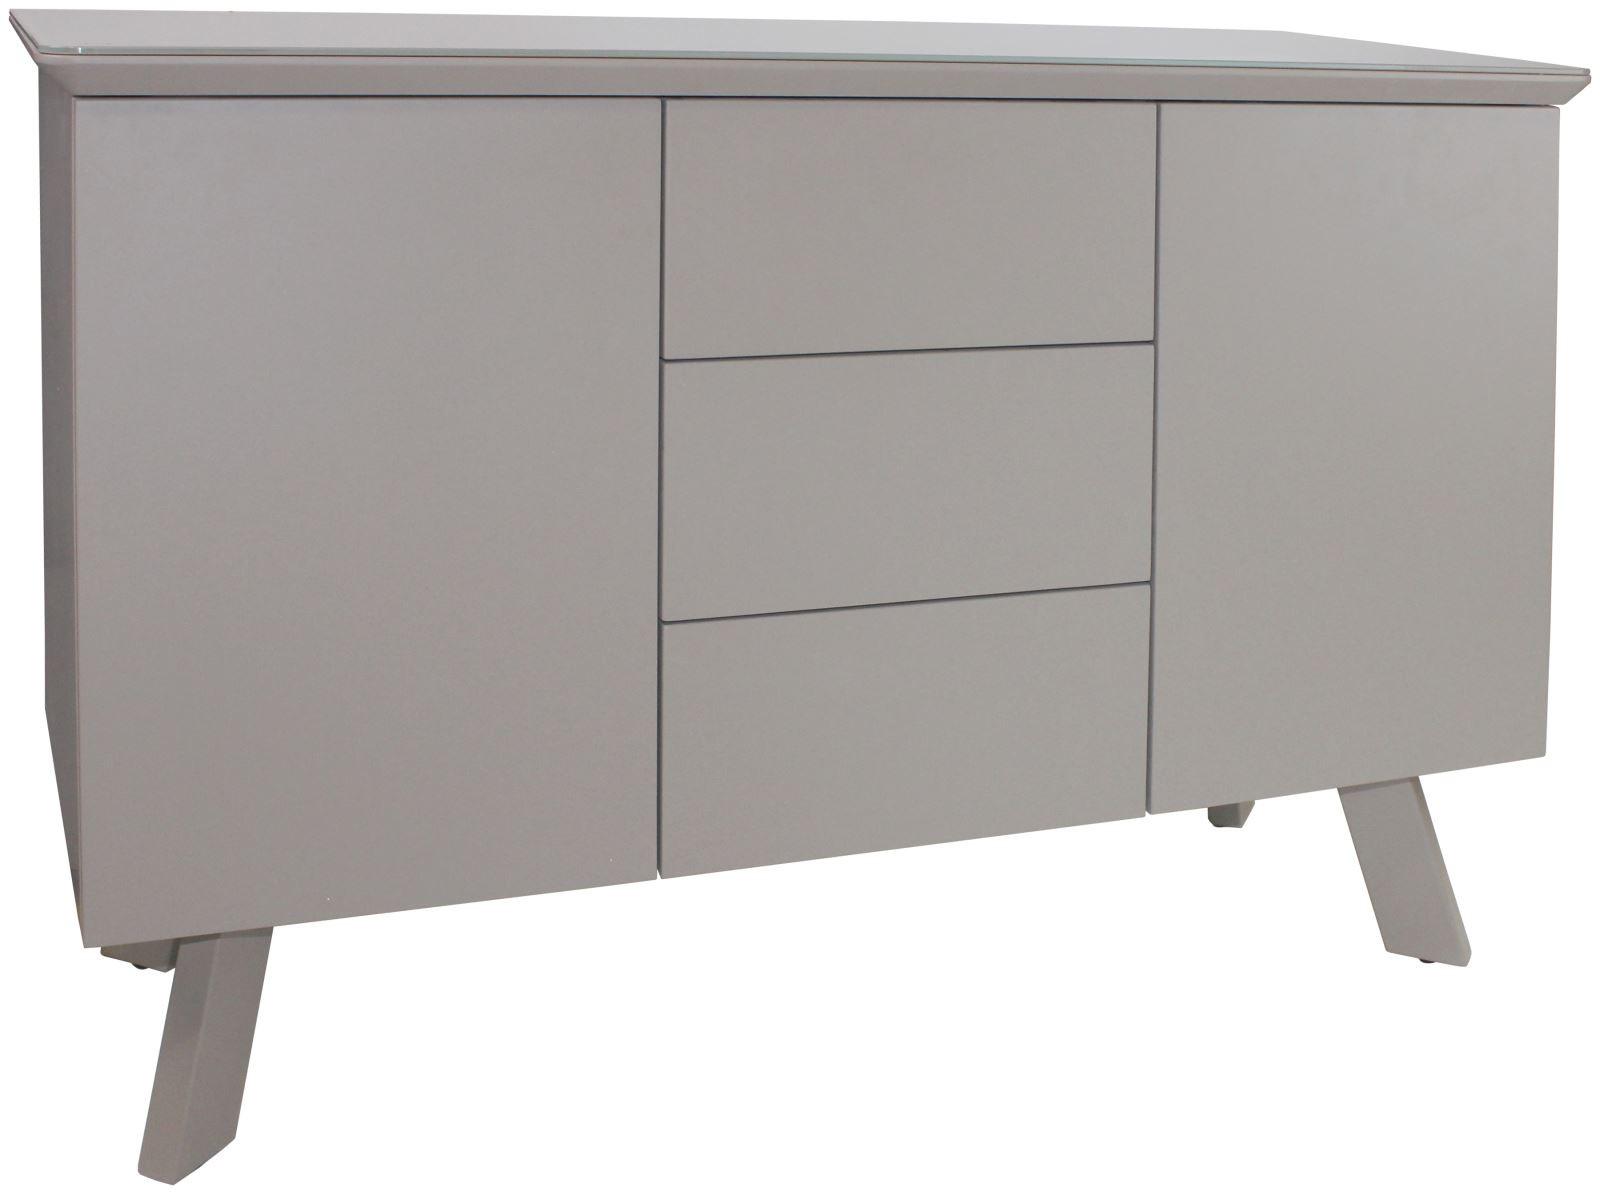 CONTEMPORARY Small Sideboard - Cappuccino